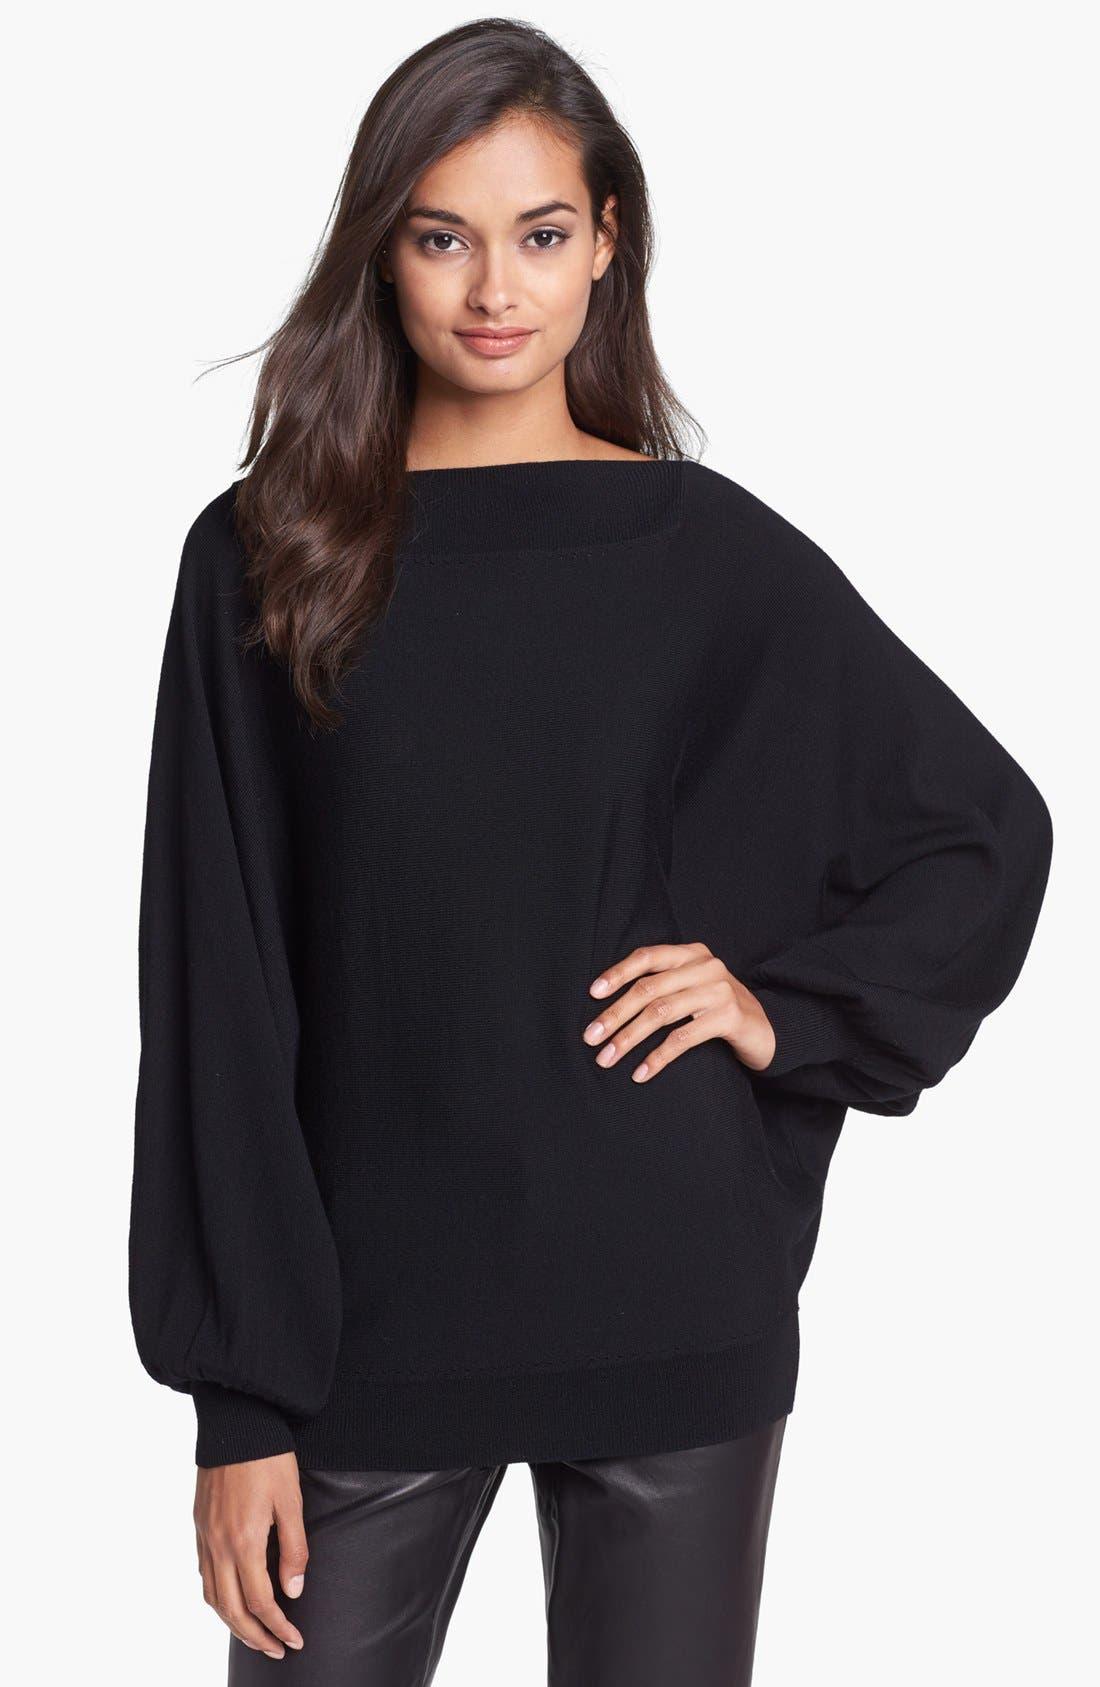 Alternate Image 1 Selected - Trina Turk 'Halima' Batwing Sweater